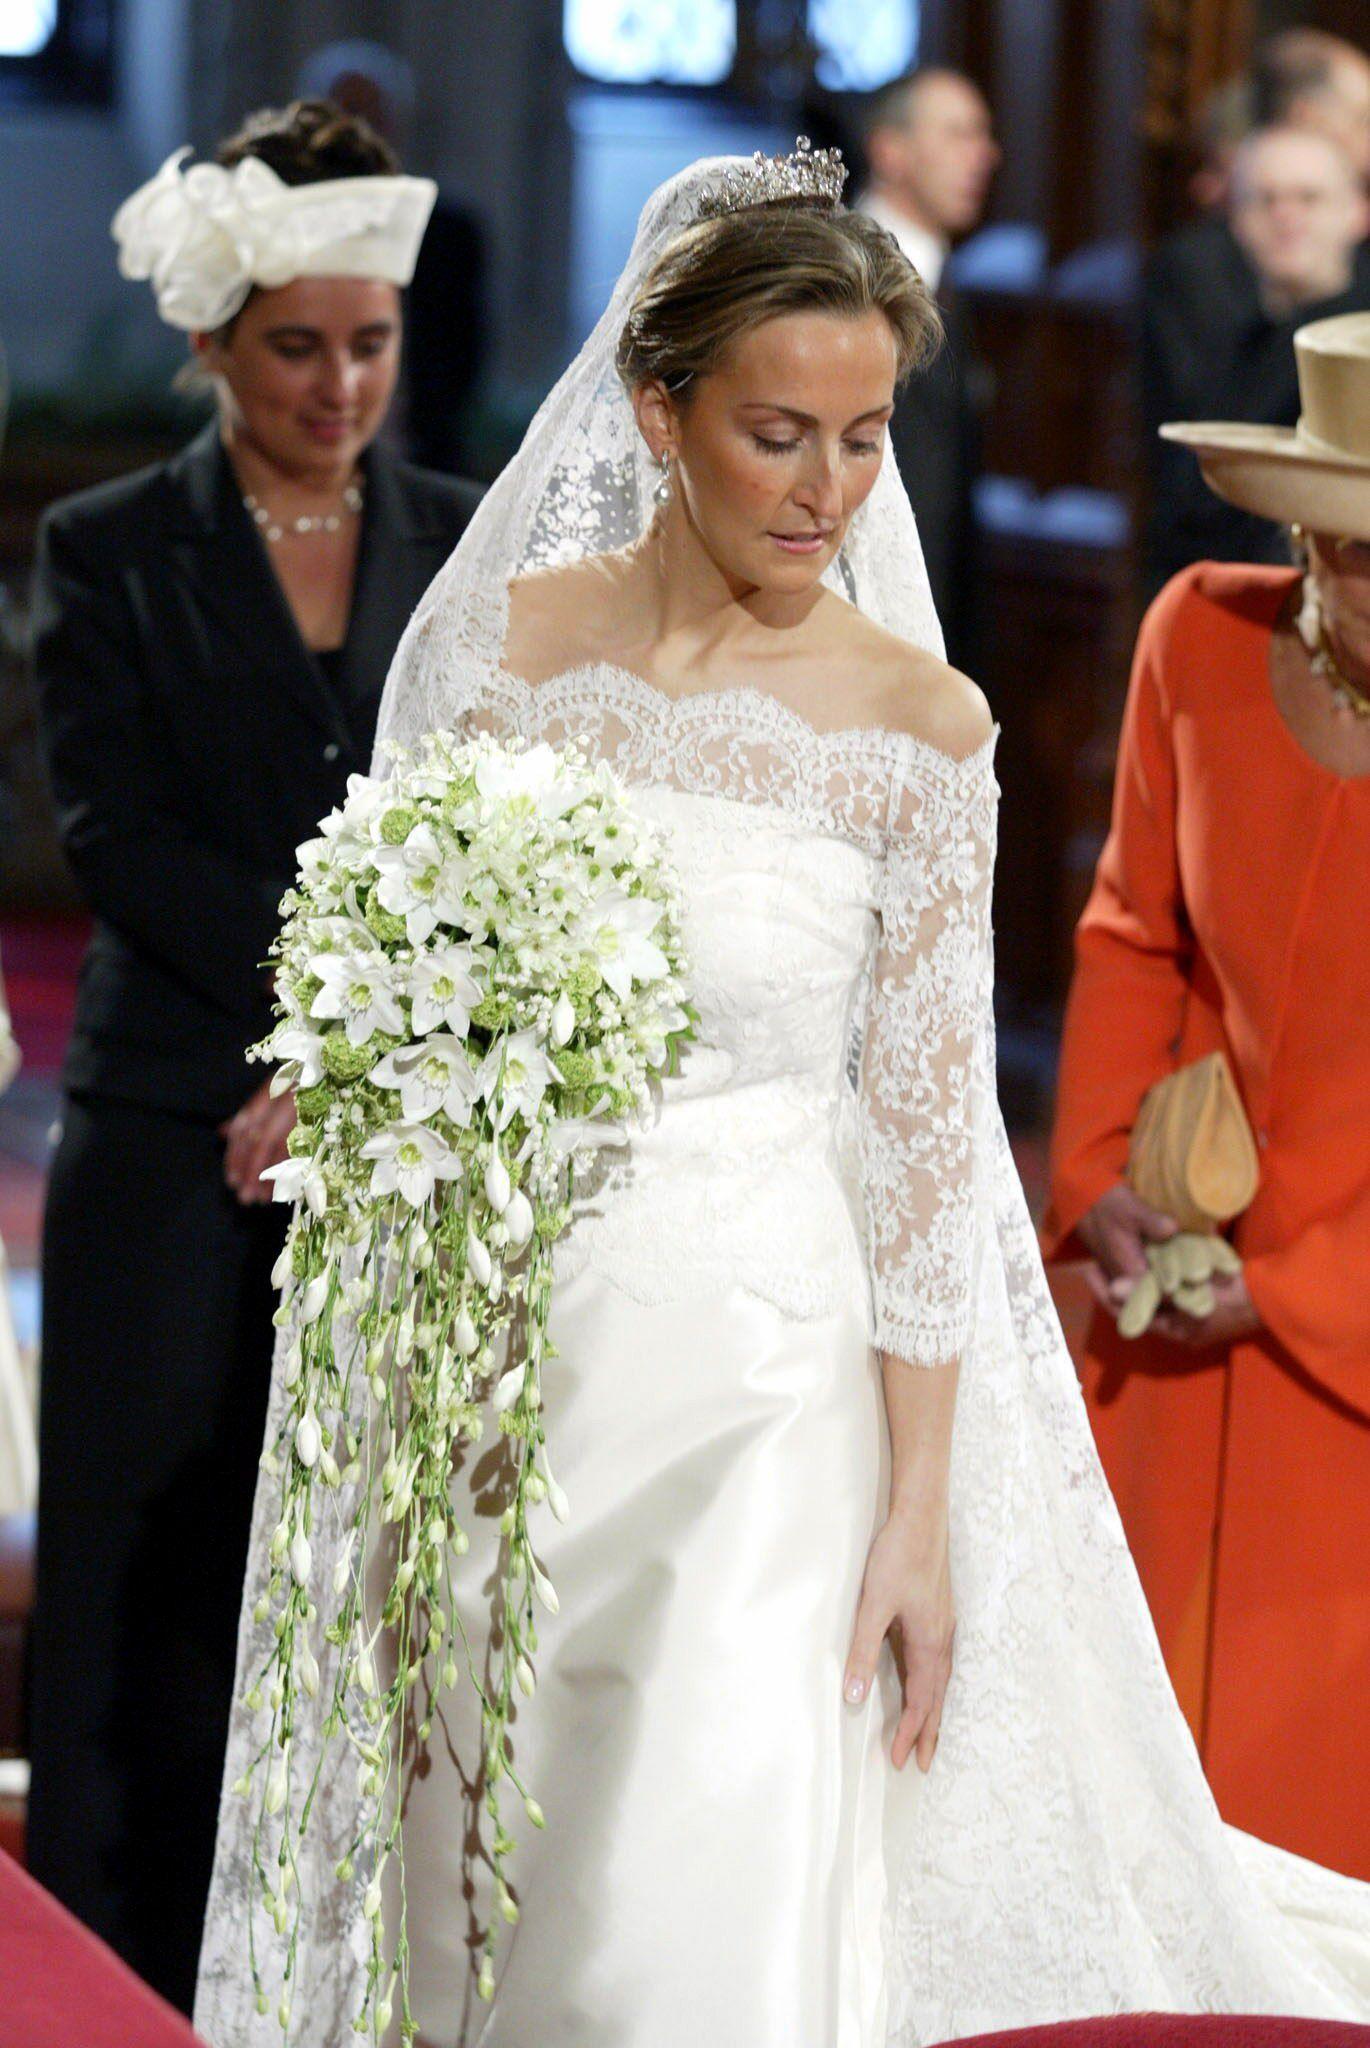 Royal Bride Prince Laurent Of Belgium Claire Coombs Royal Wedding Dress Royal Wedding Gowns Royal Brides [ jpg ]